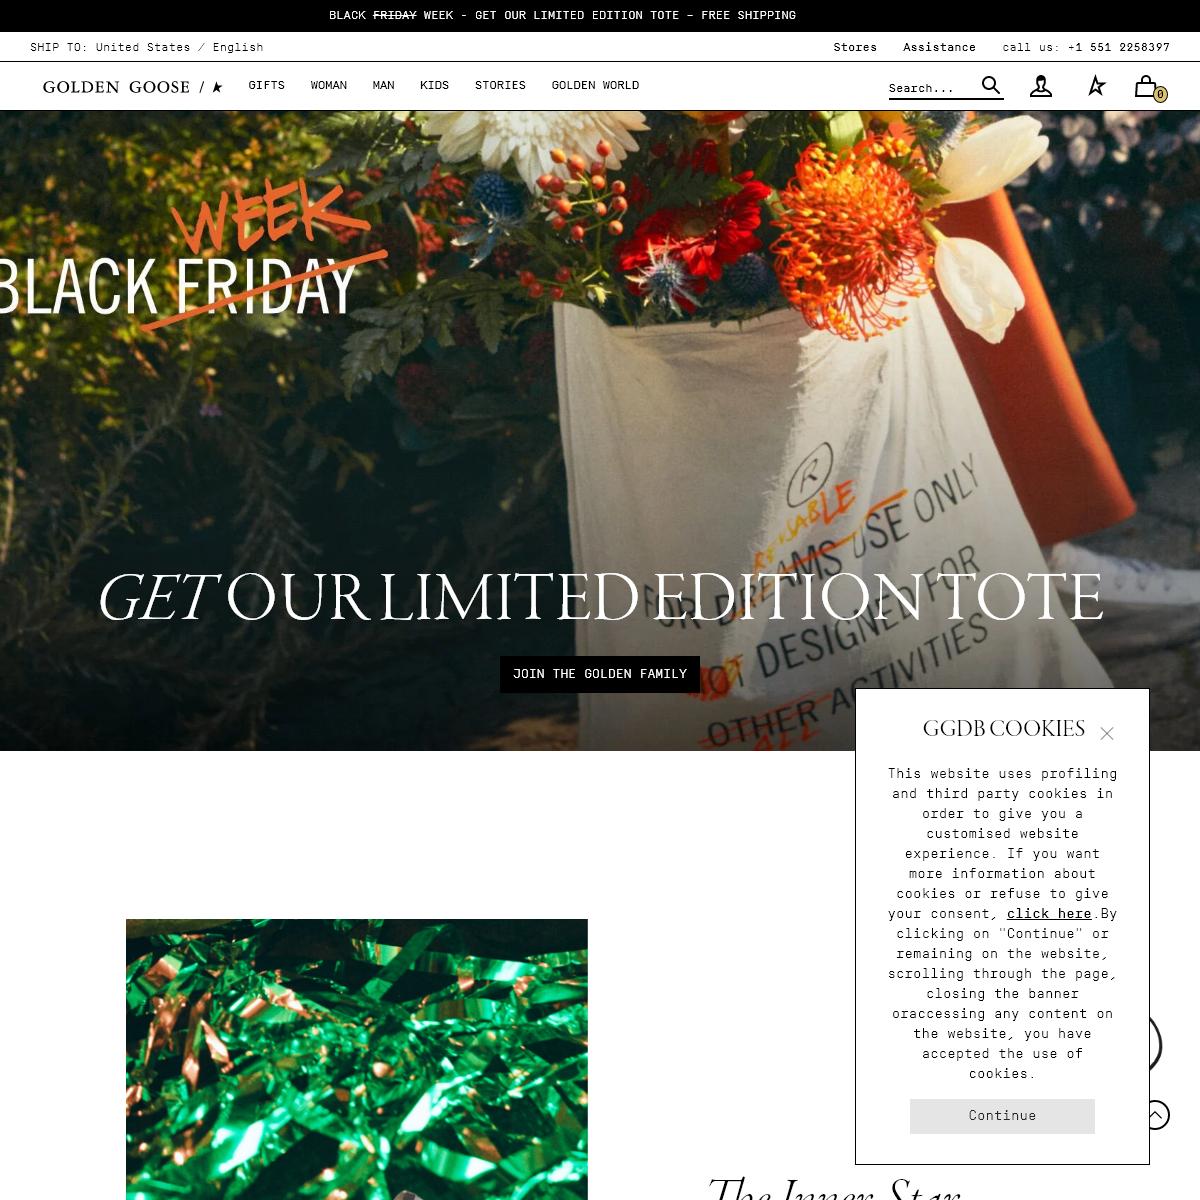 Golden Goose - Official Website